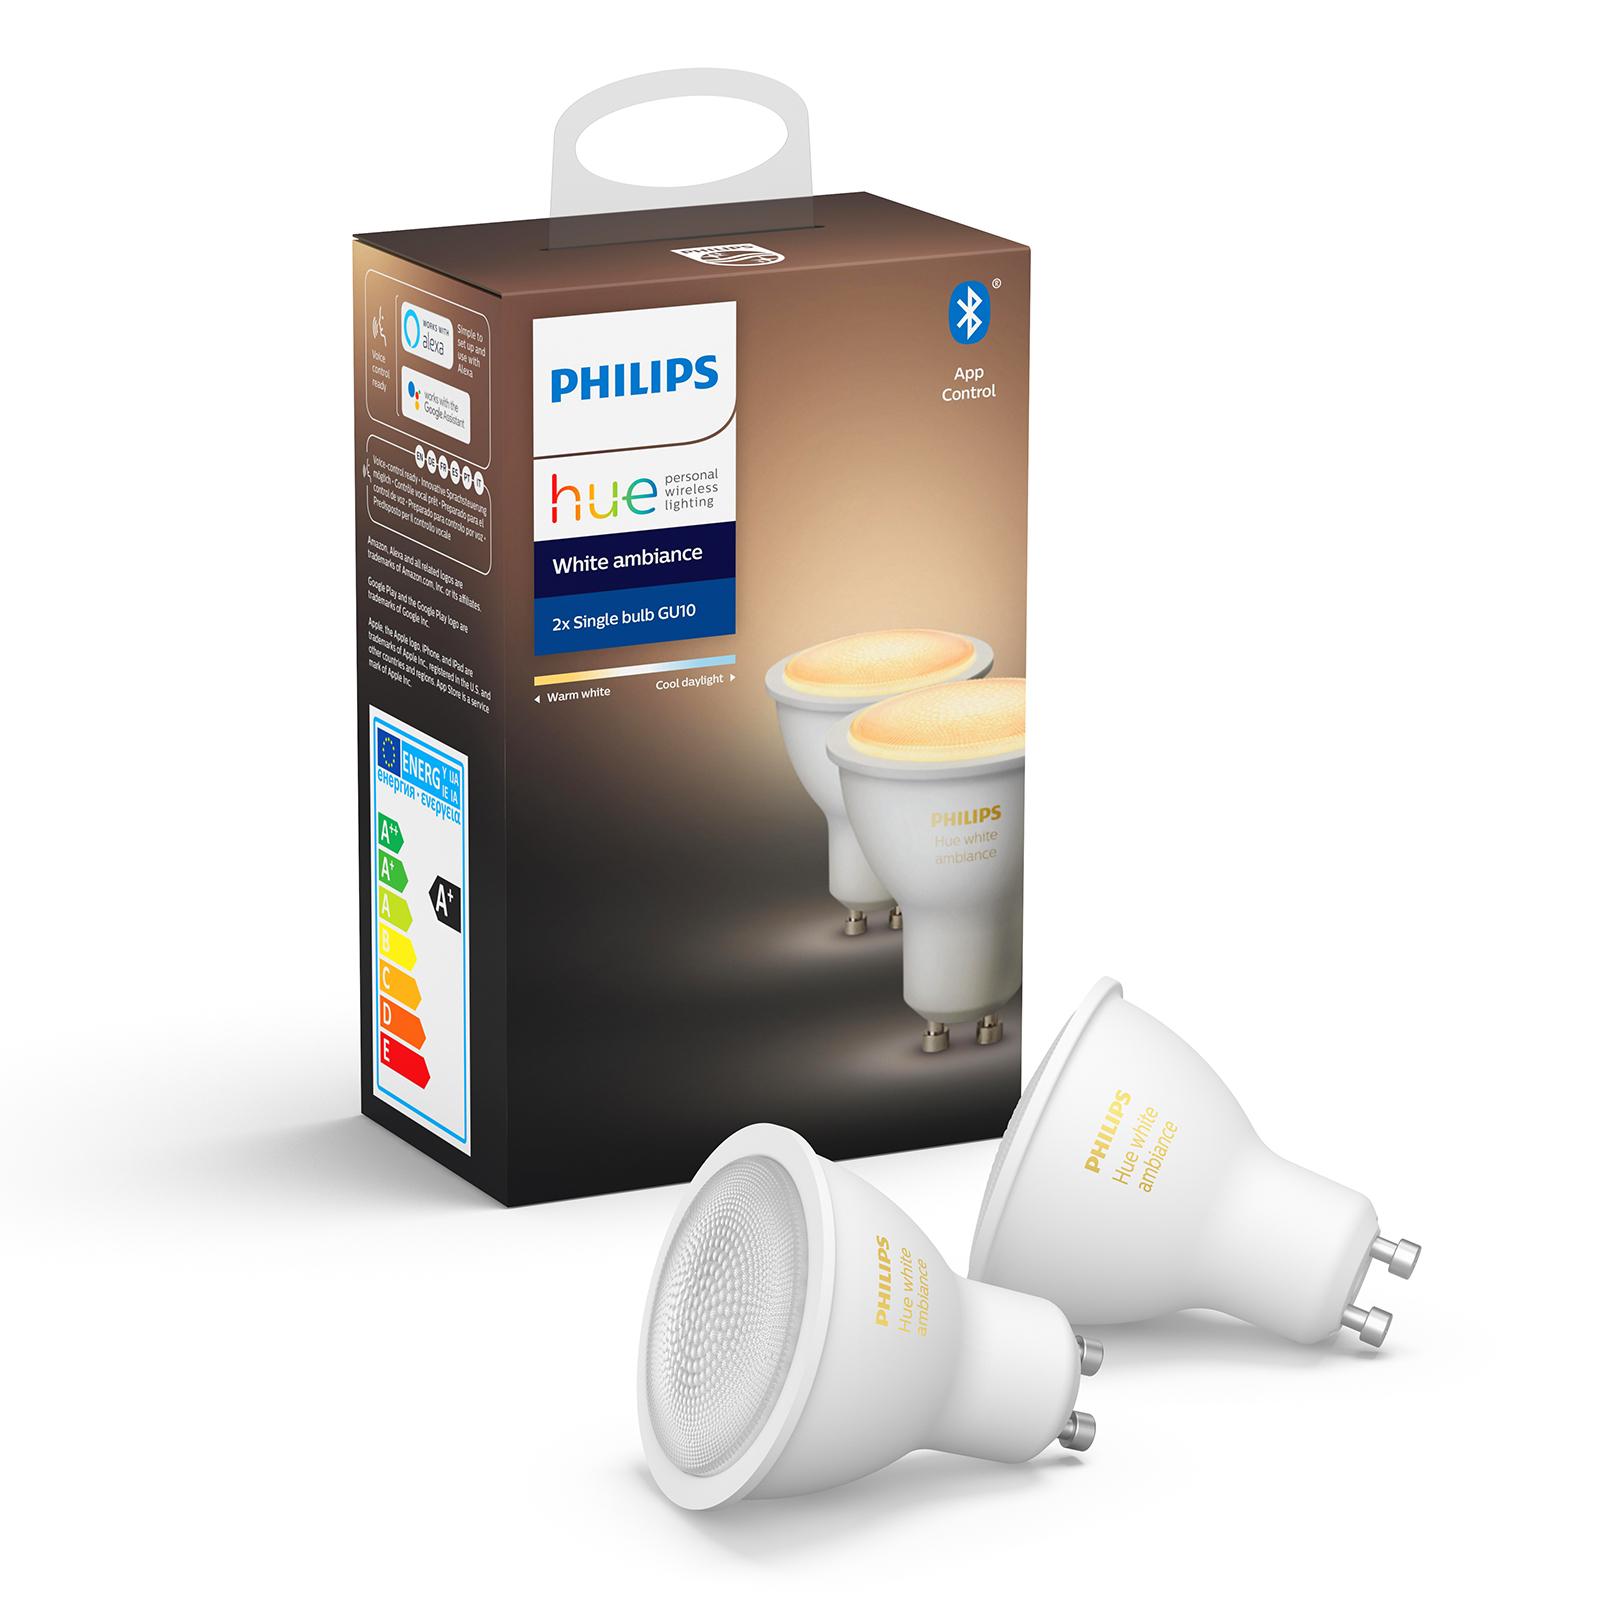 Philips Hue White Ambiance 5 W GU10 LED, set de 2